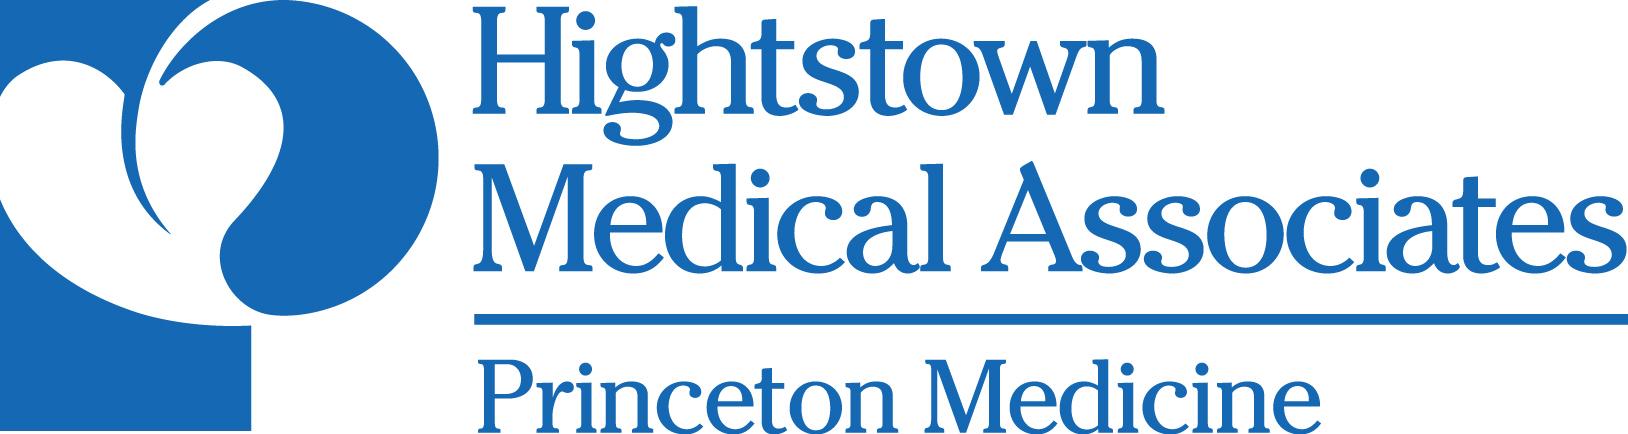 Hightstown Medical Associates Joins Princeton Medicine